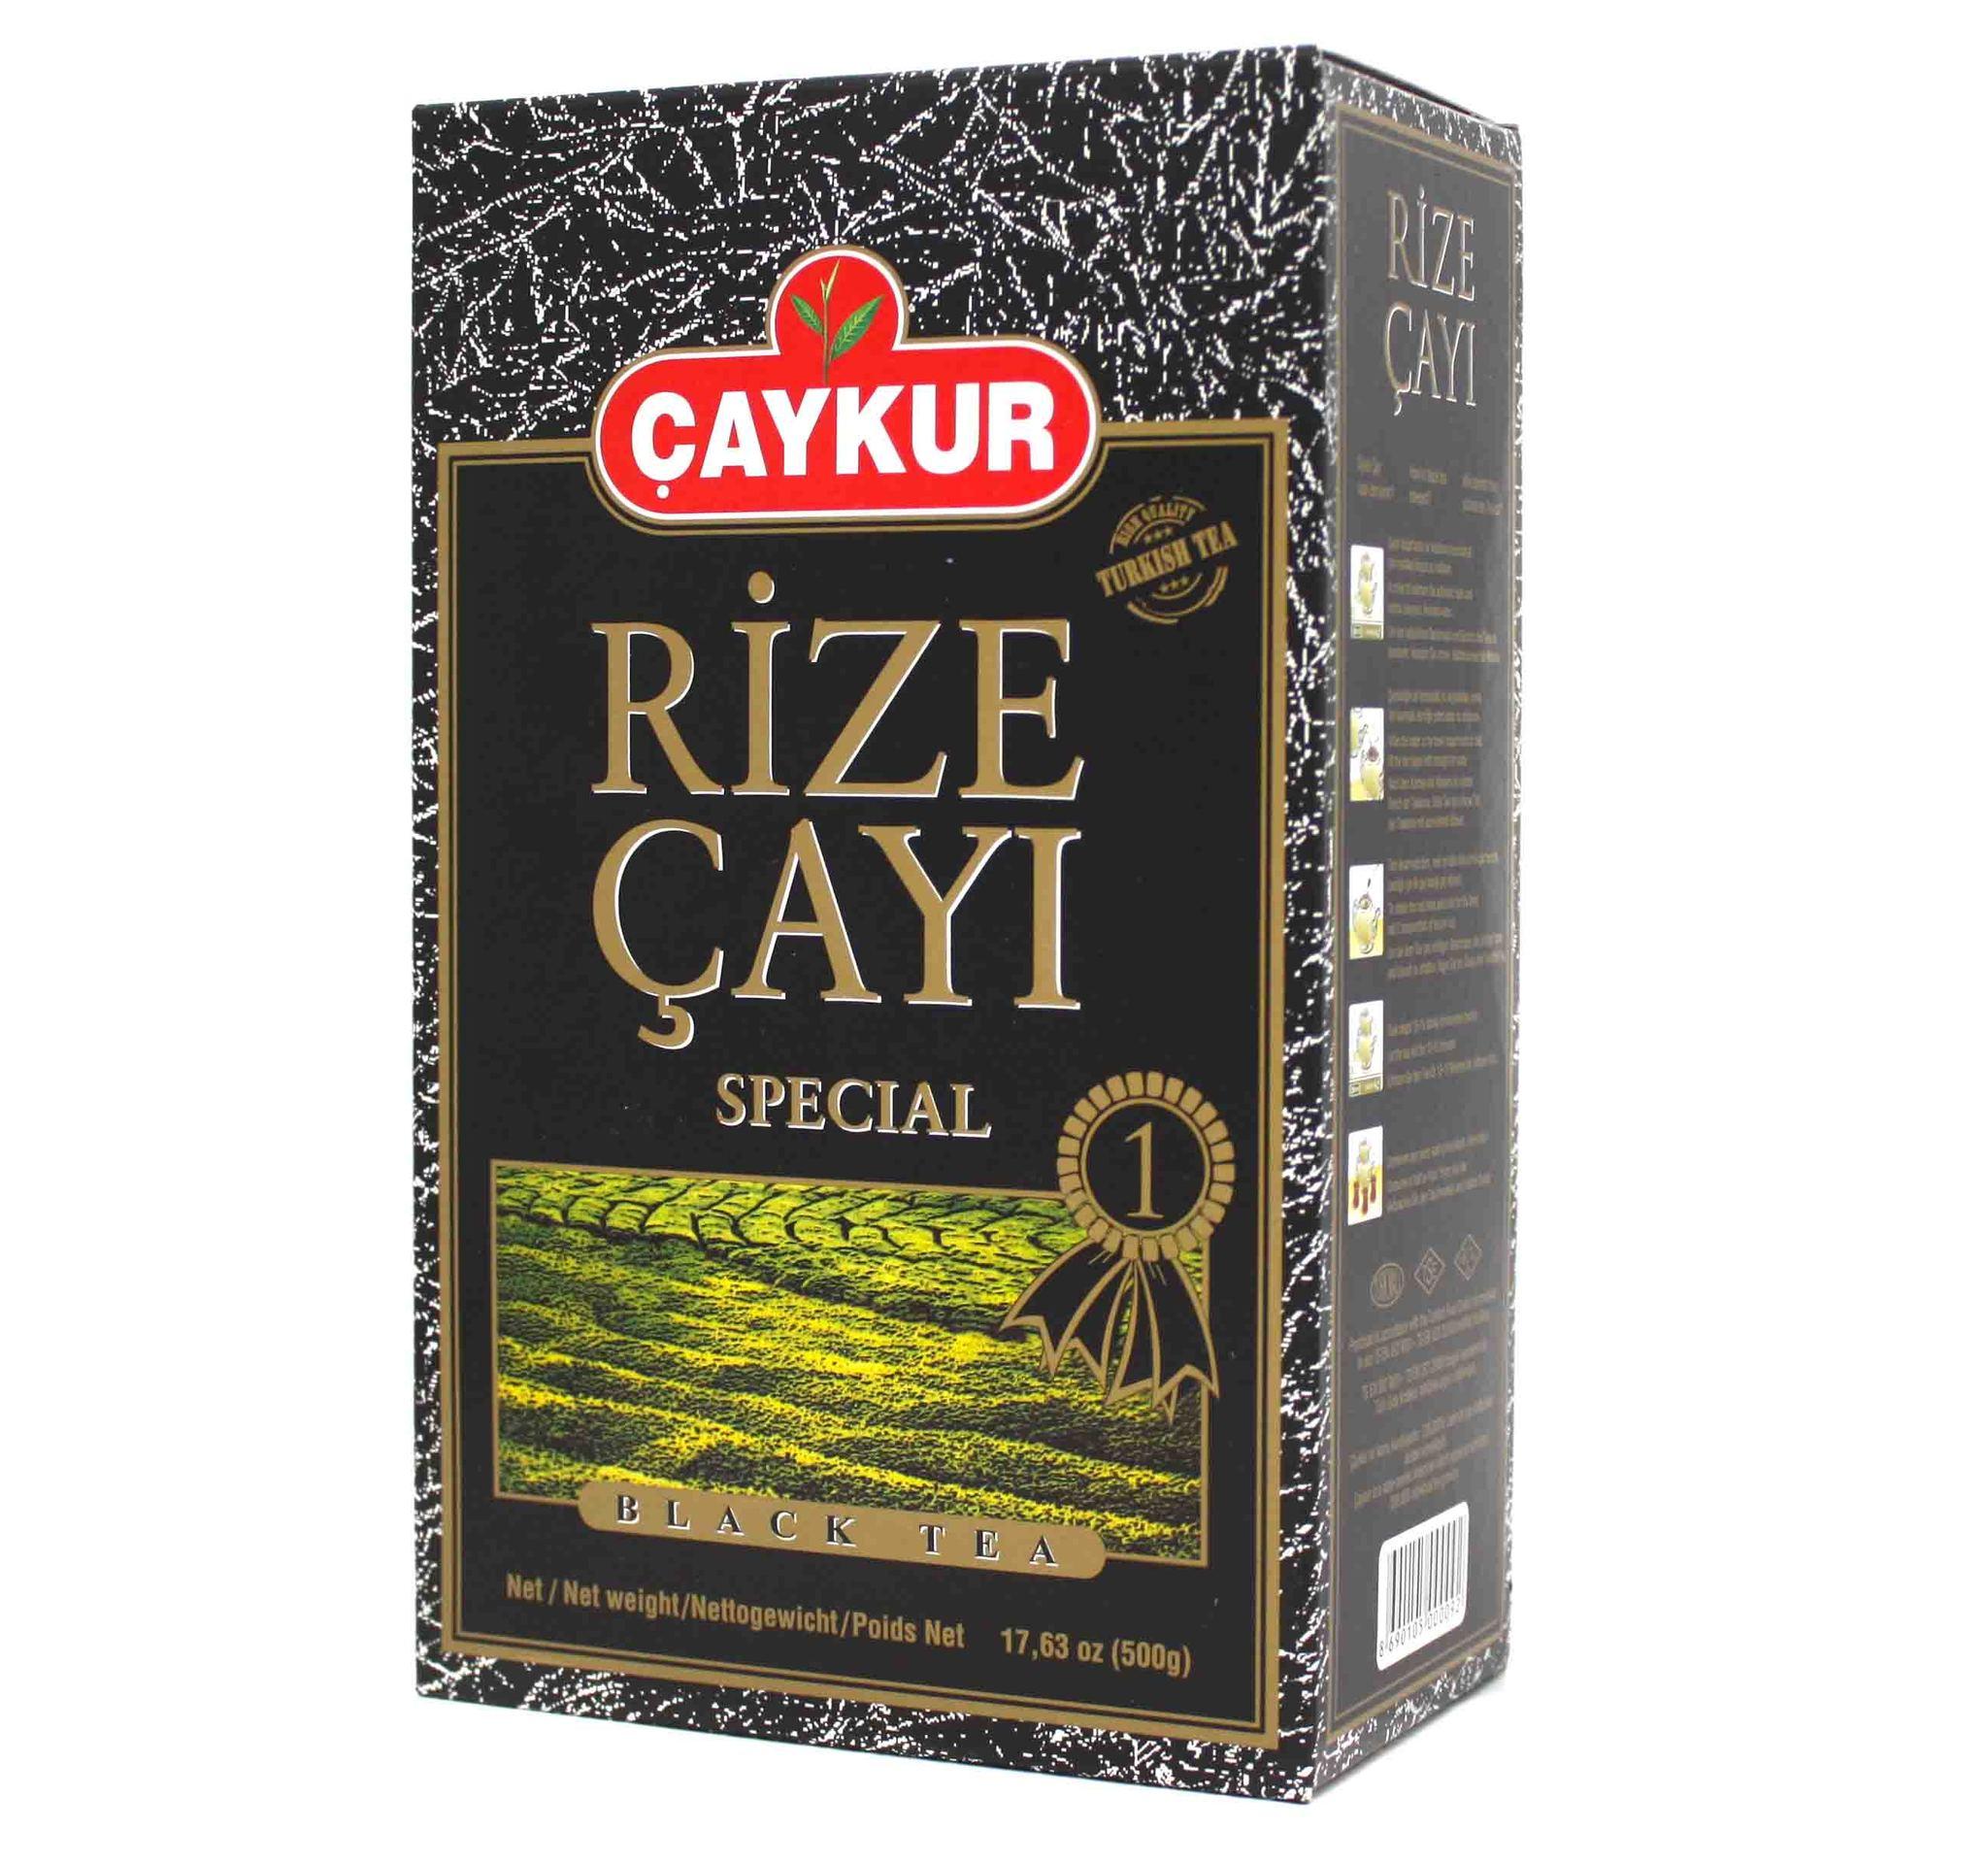 Çaykur Турецкий черный чай Rize Special, Çaykur, 500 г import_files_97_9722ec1b6c5511eaa9c7484d7ecee297_ca1bb5b17afc11eaa9c8484d7ecee297.jpg